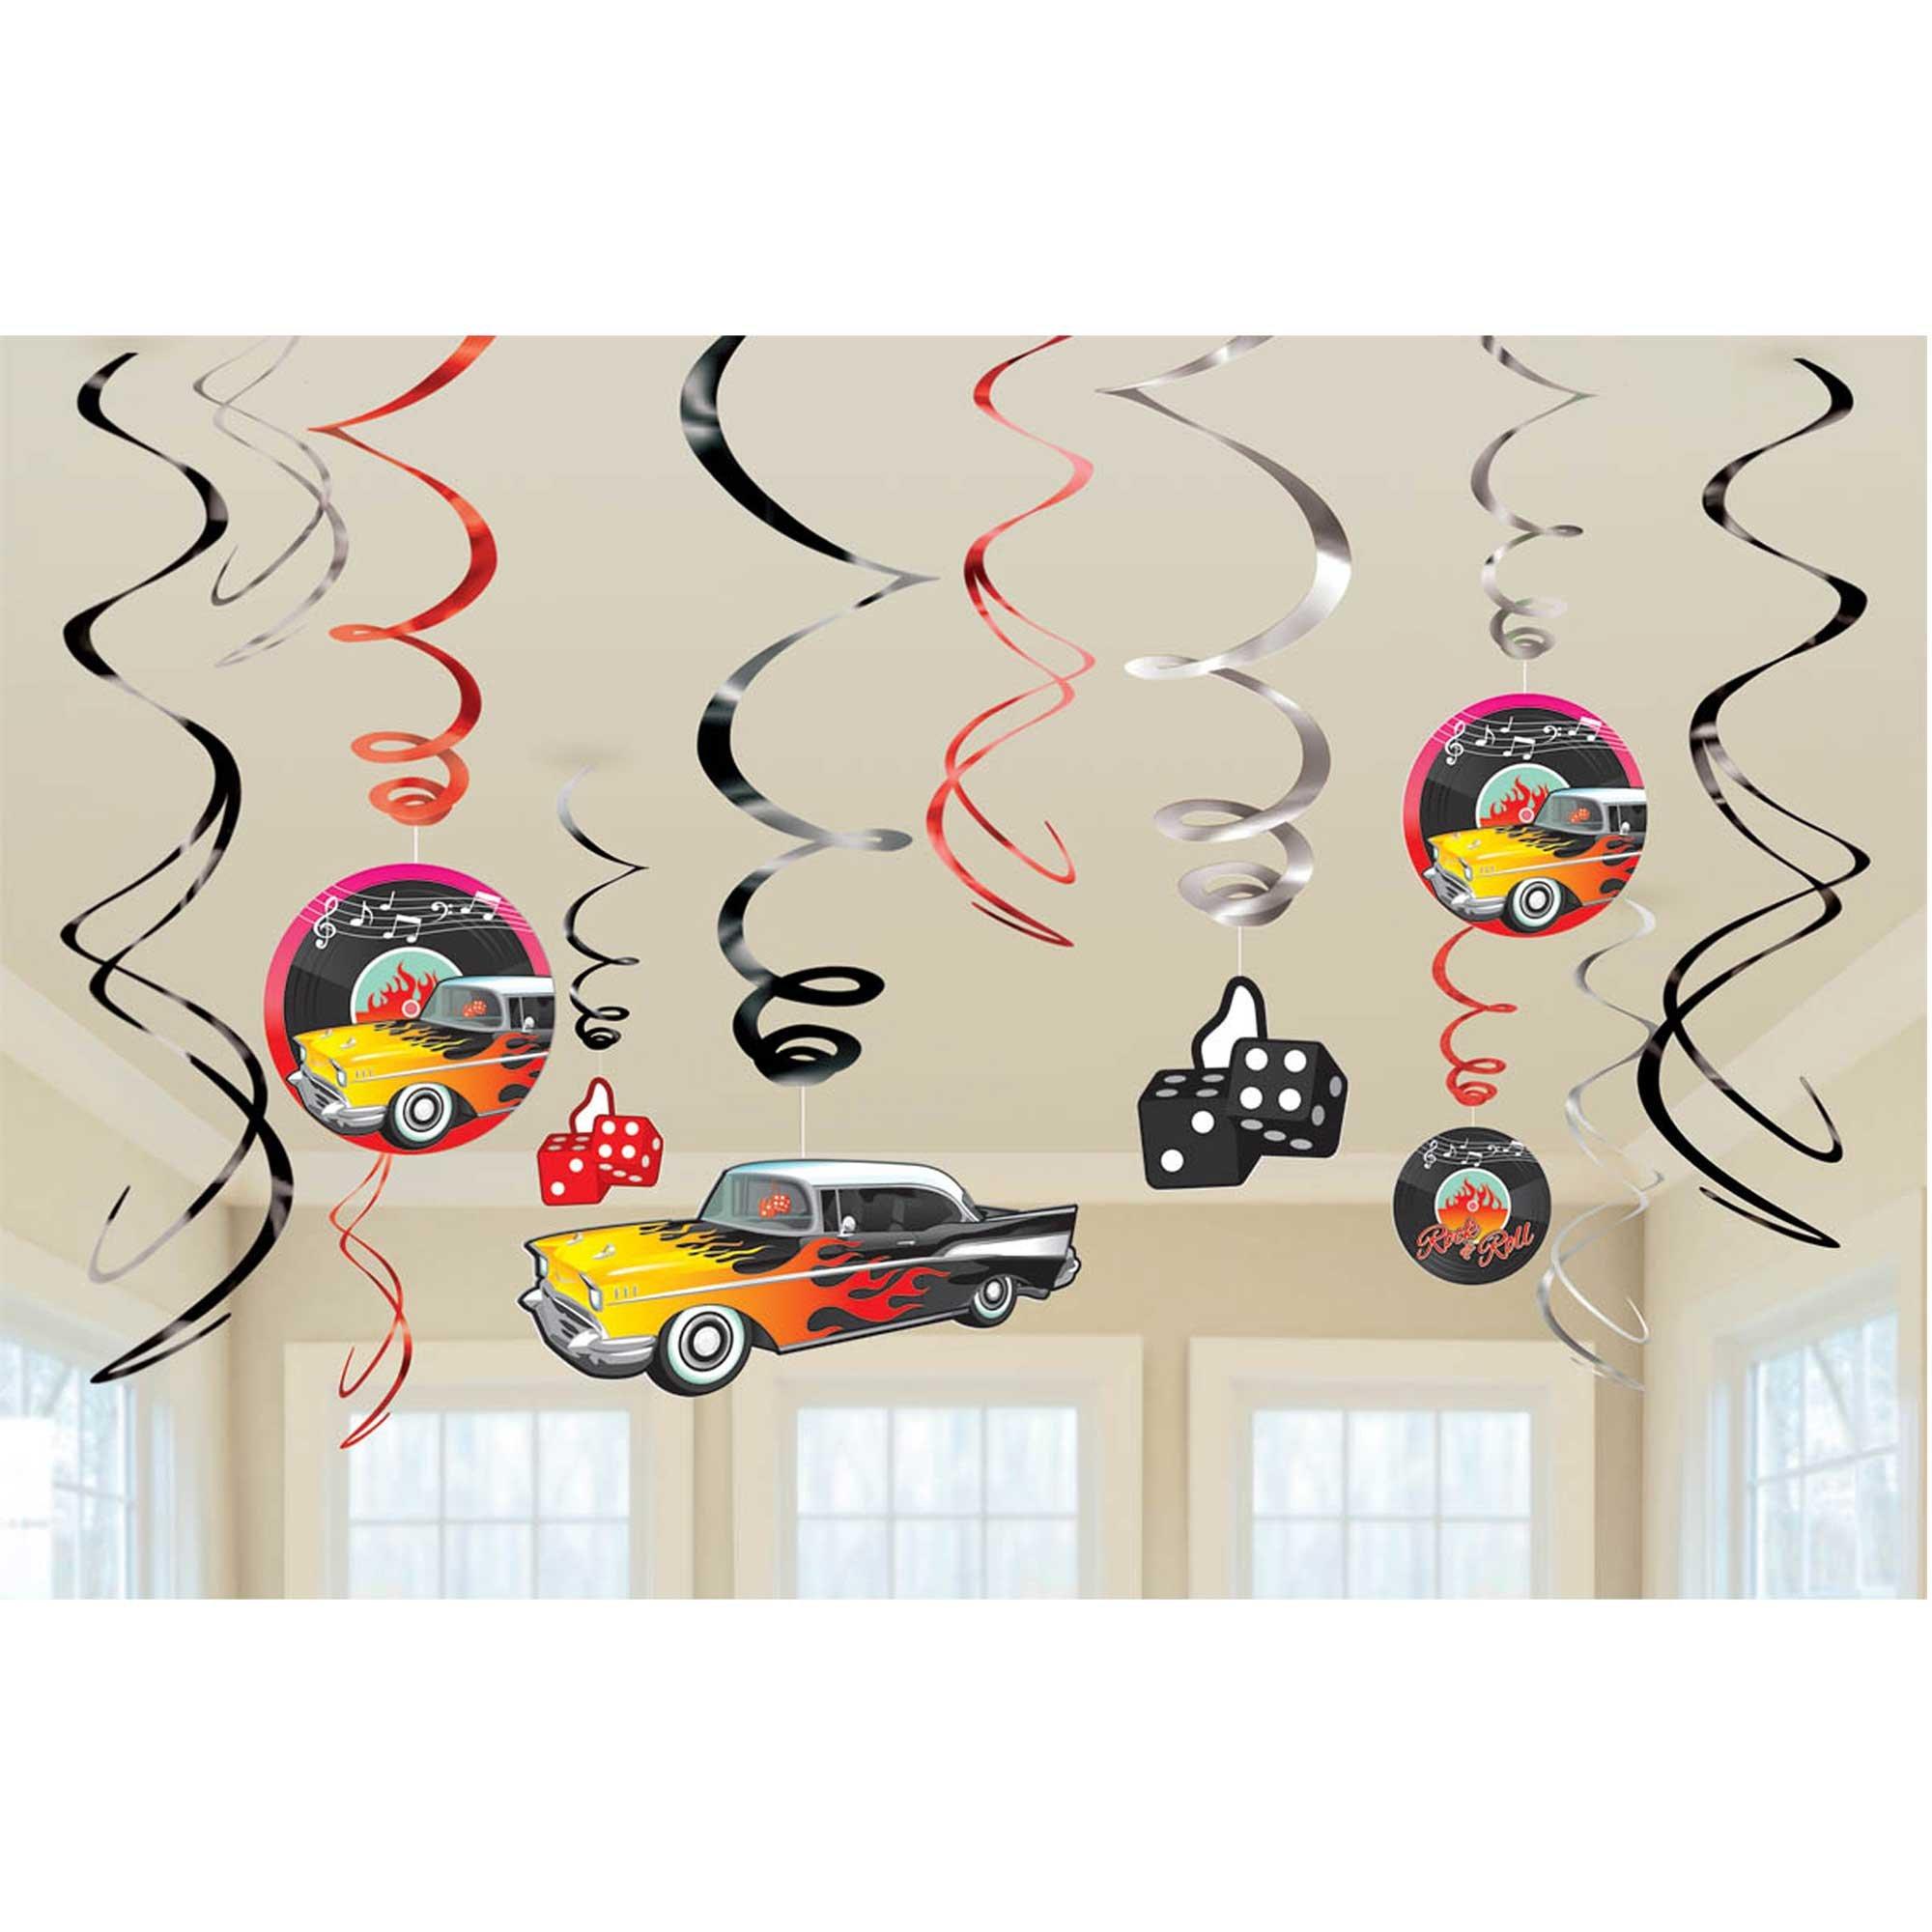 Classic 50's Hanging Swirl Decorations